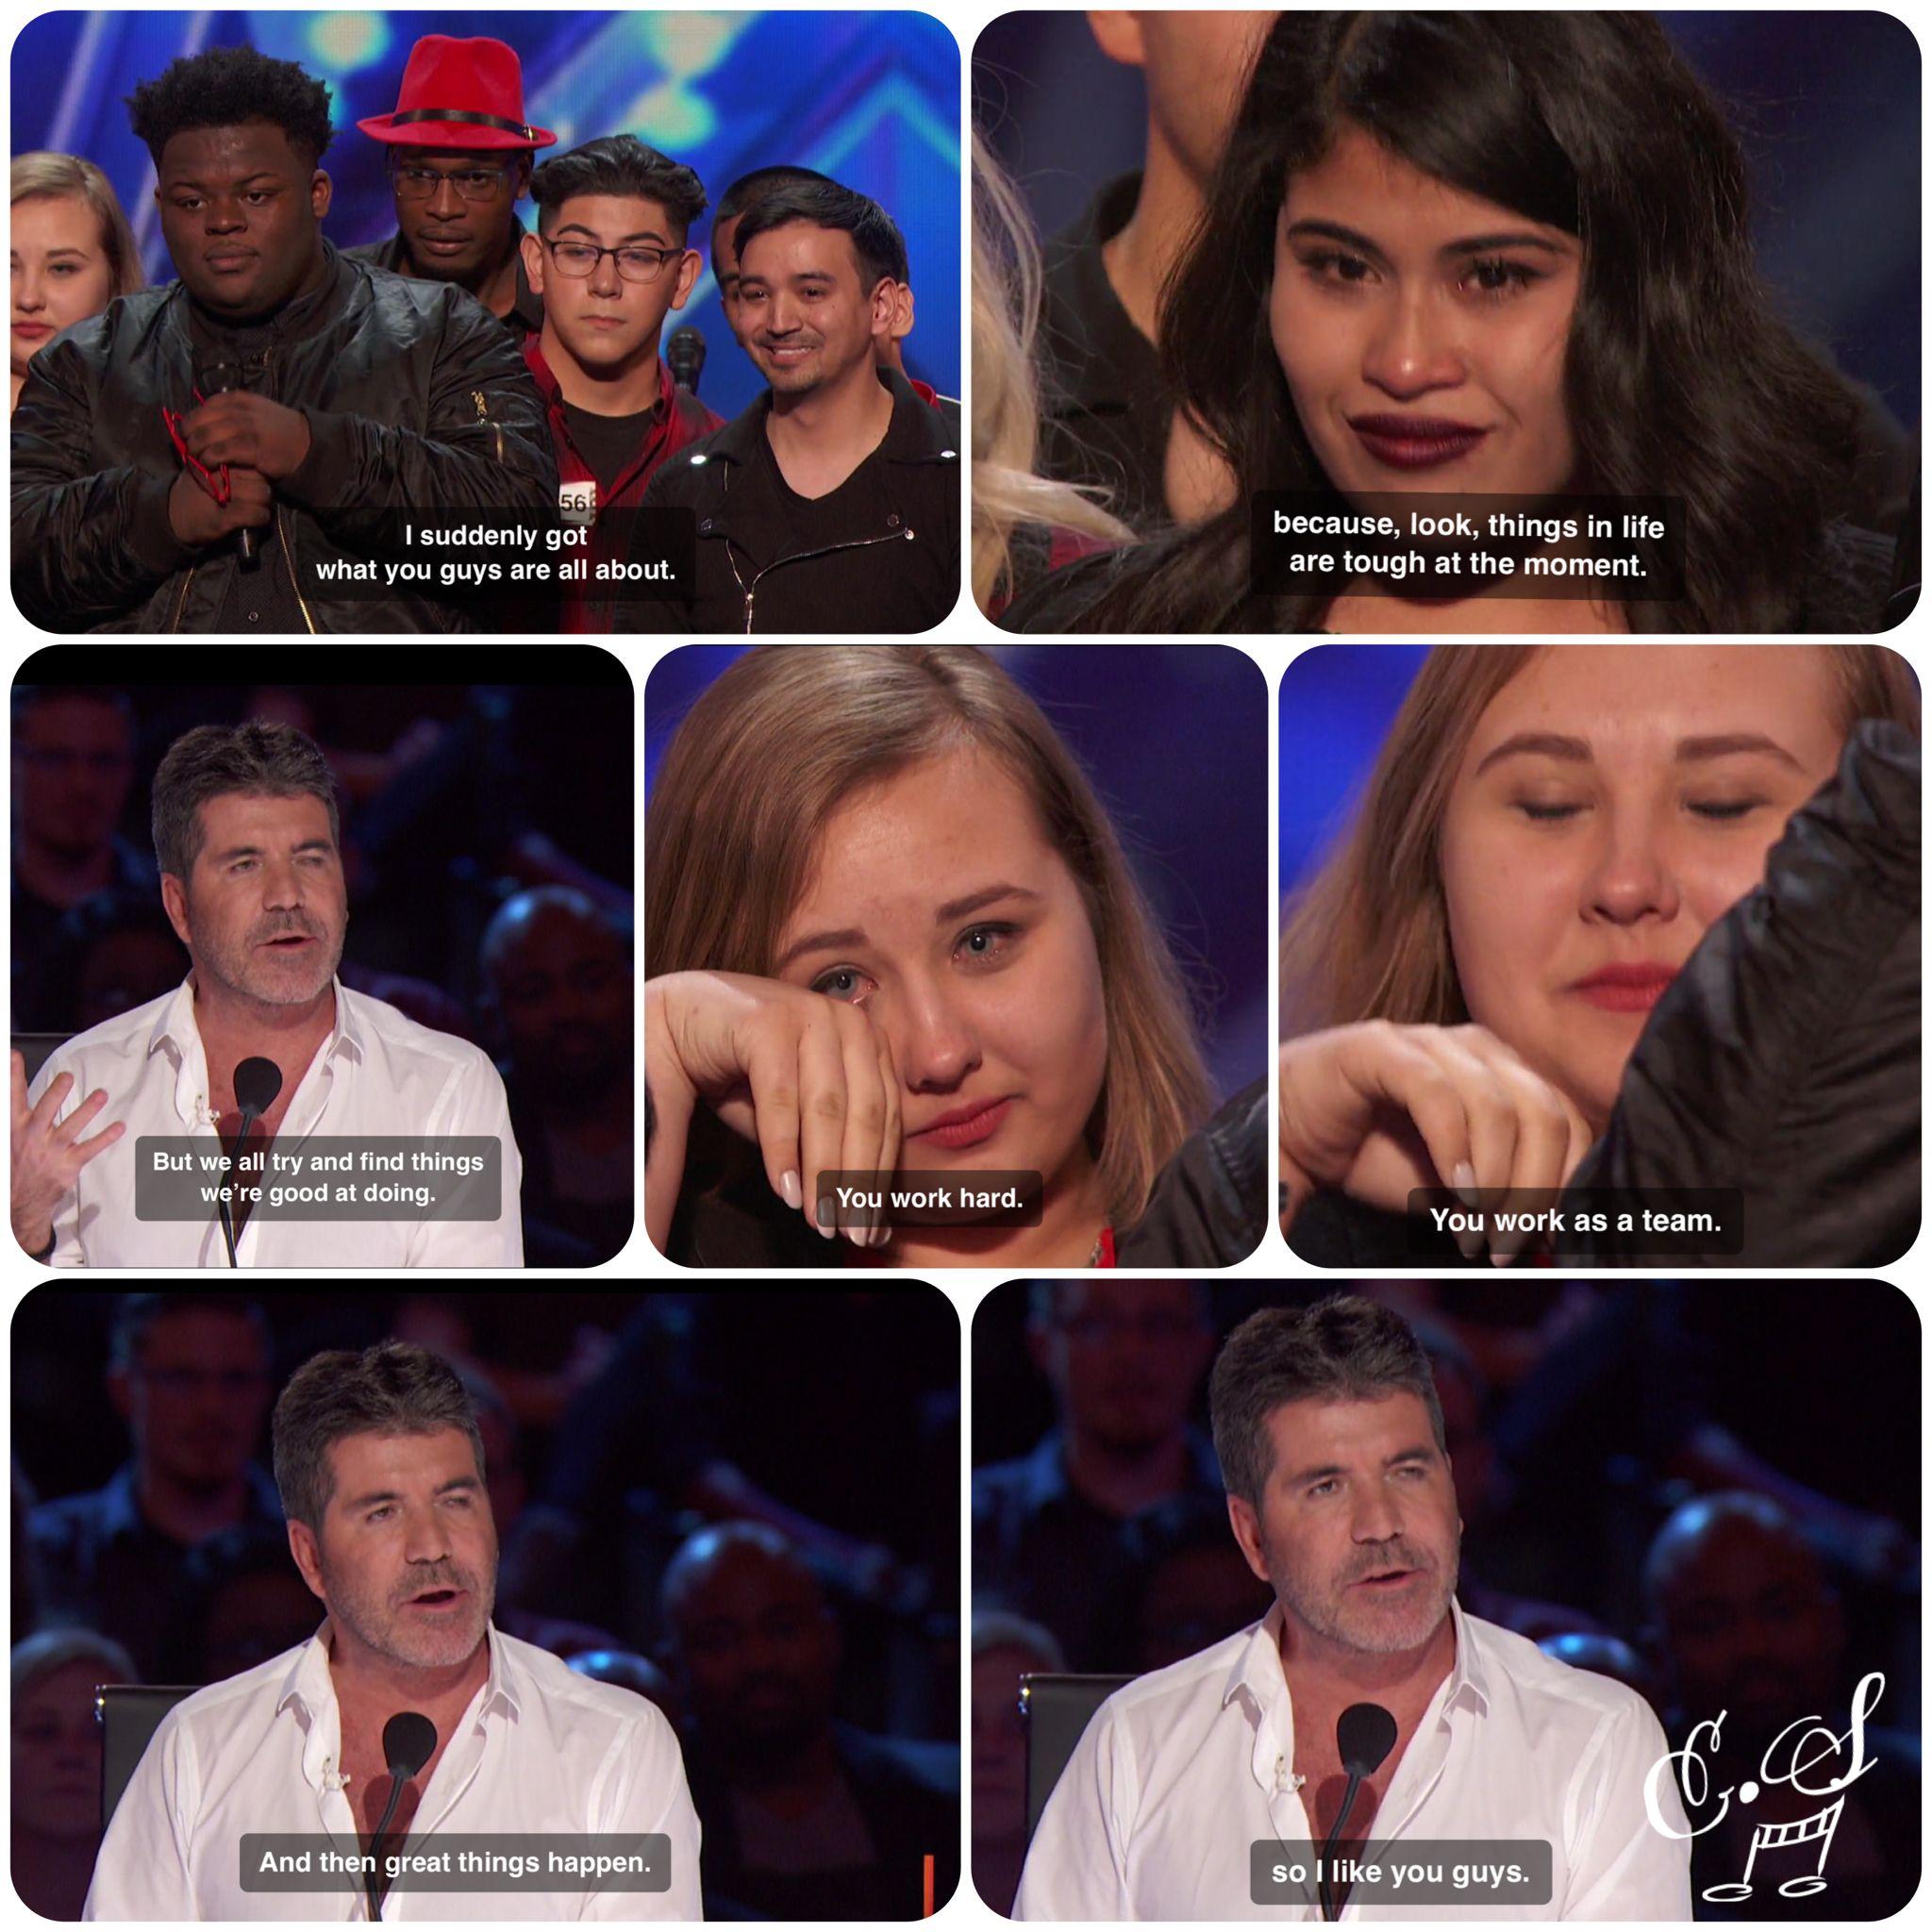 Simon Cowell On Americas' Got Talent